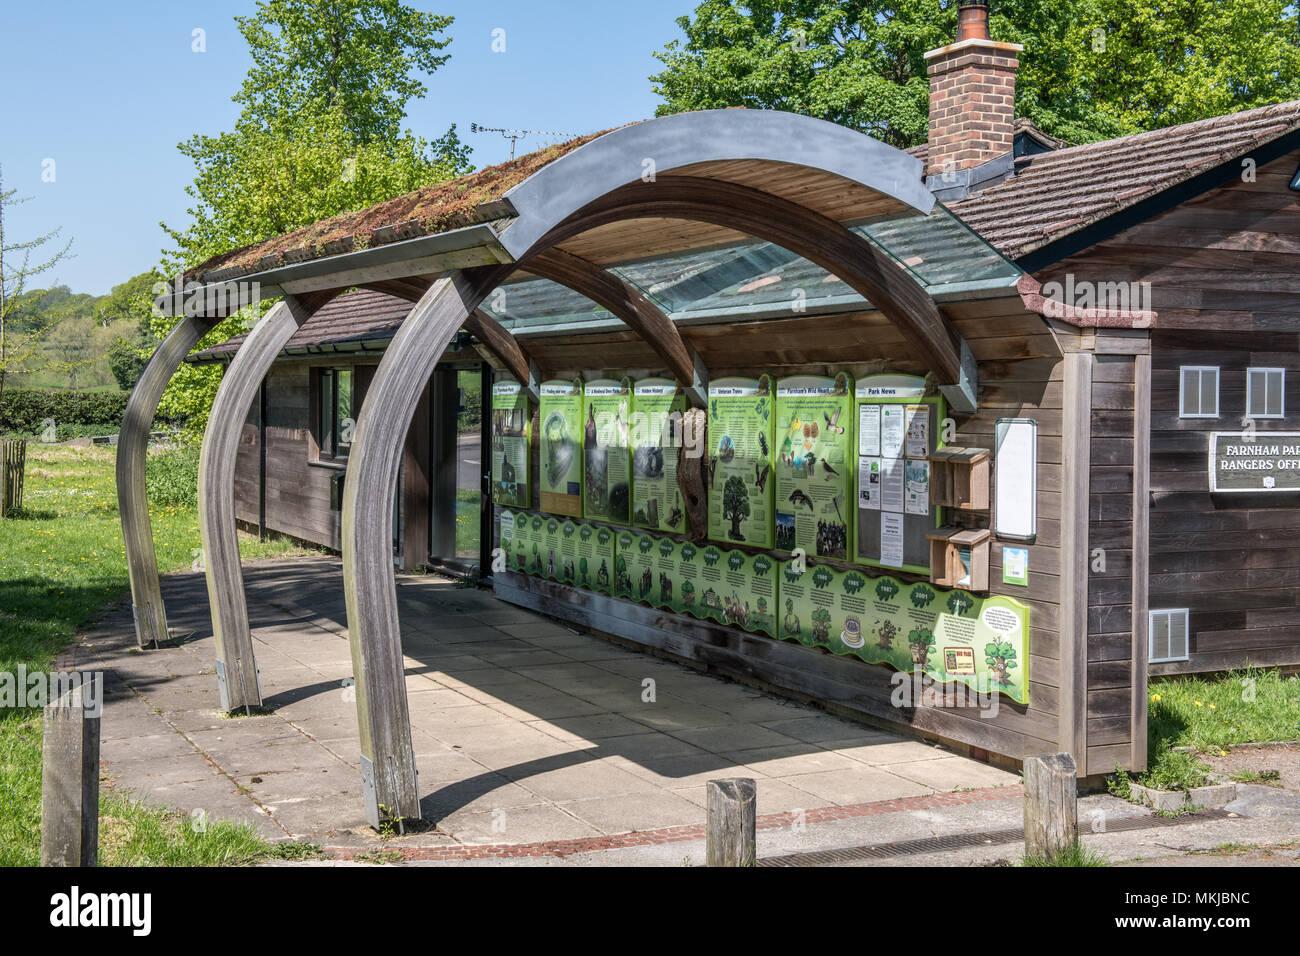 The Entrance to Farnham Park, Farnham in Surrey - Stock Image